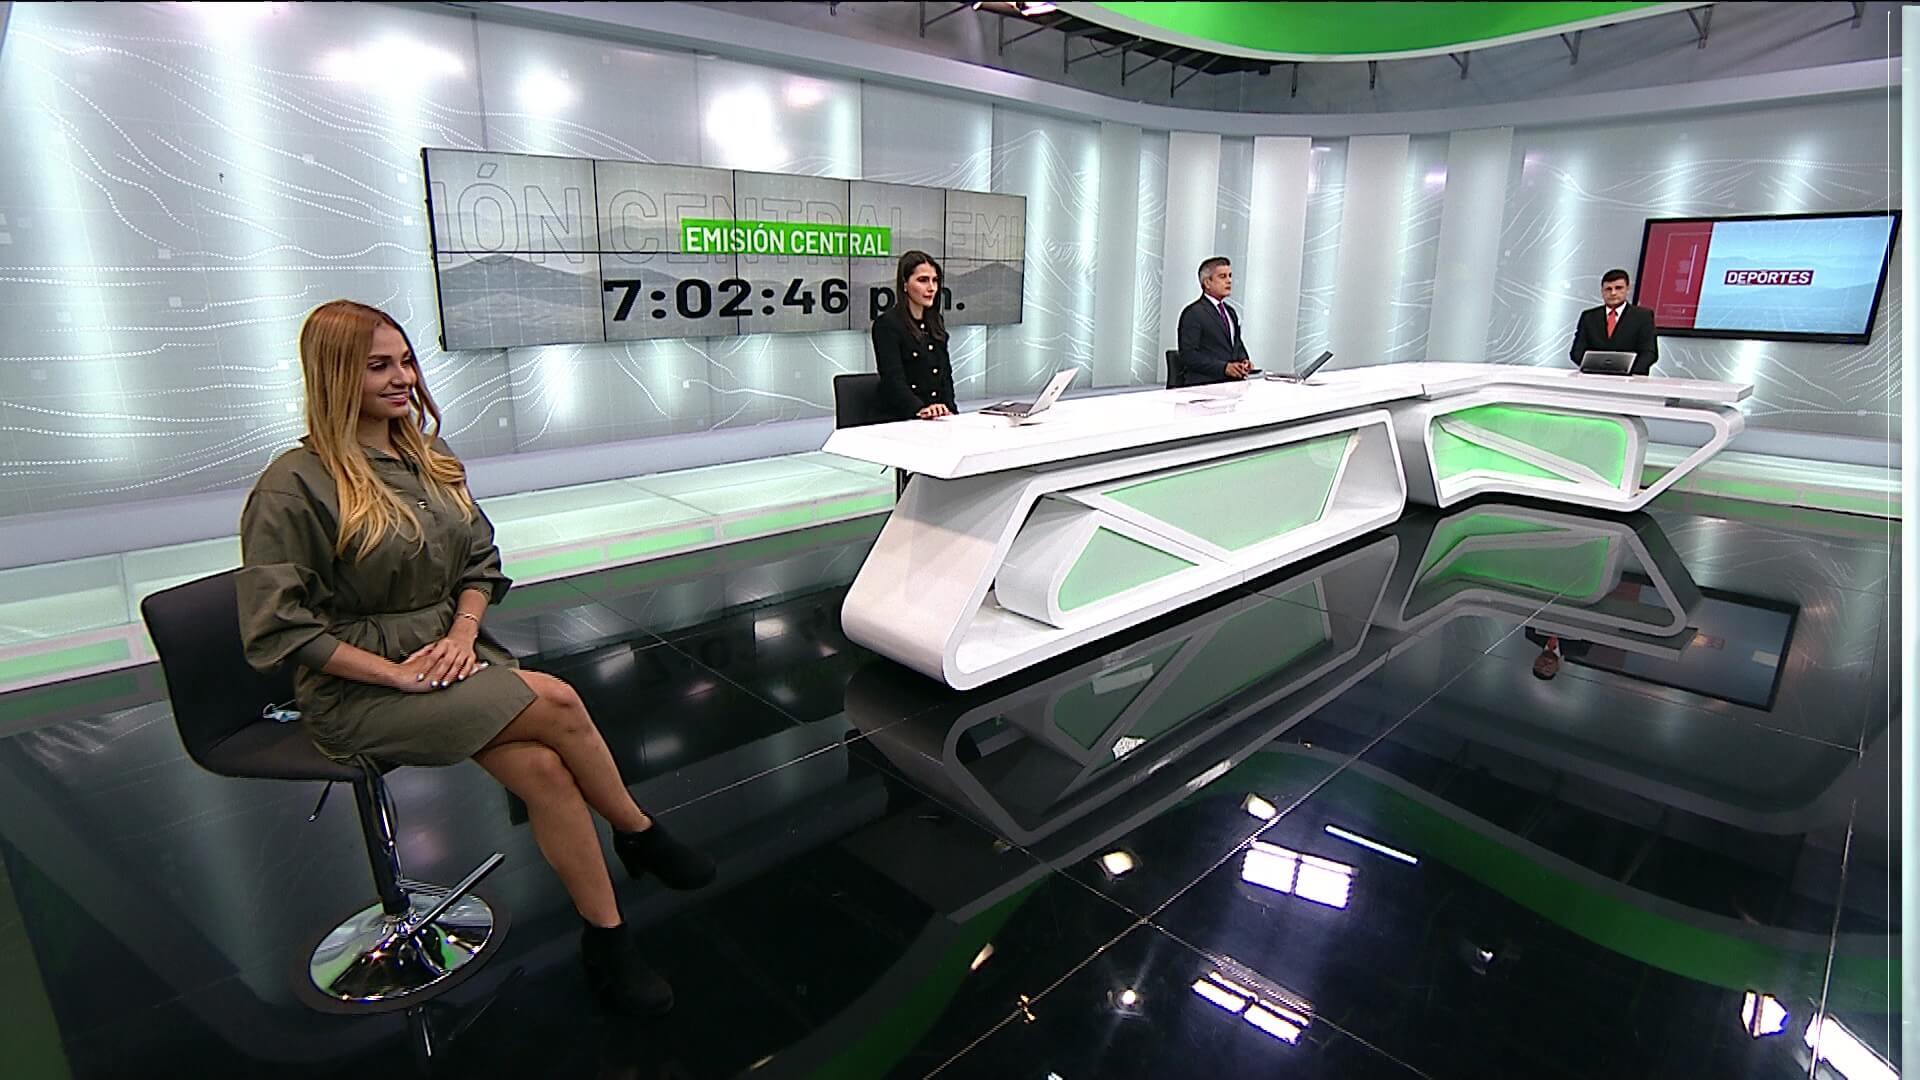 Teleantioquia Noticias - miércoles 5 de mayo de 2021